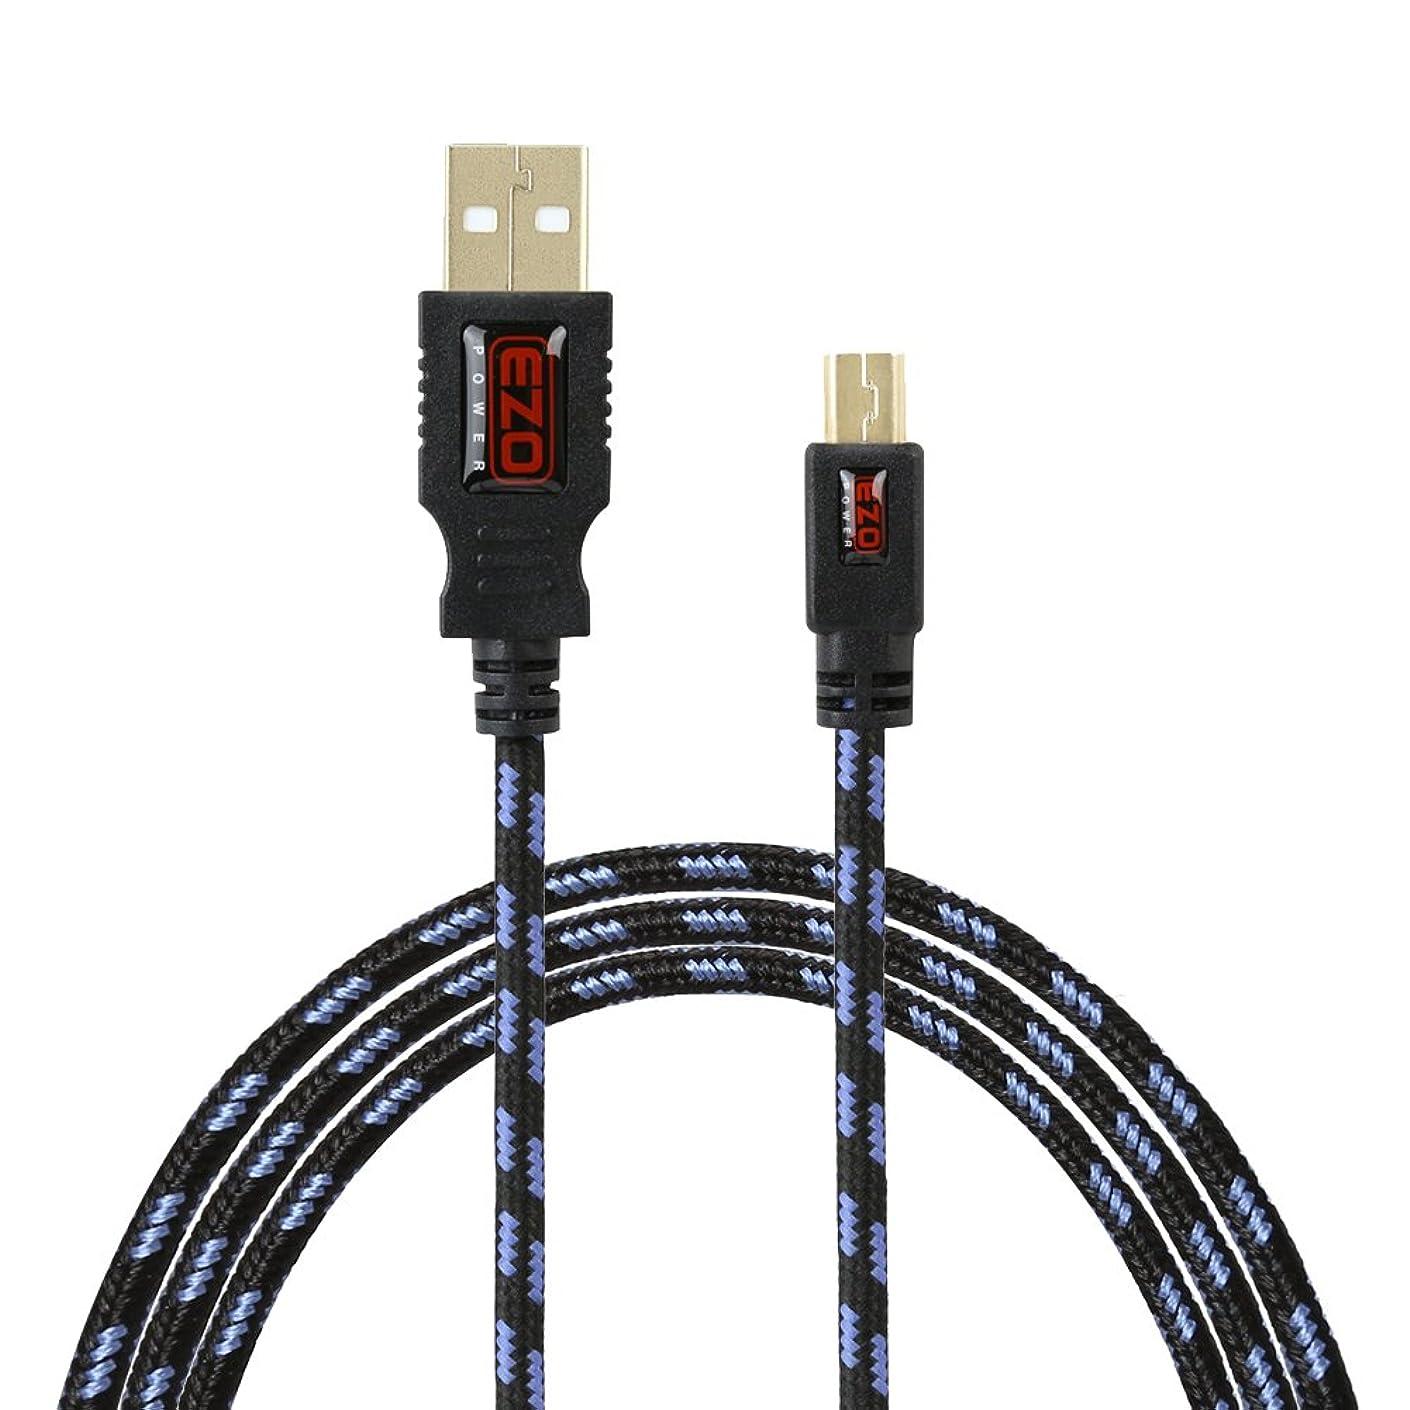 EZOPower 6 feet Mini-USB 5-Pin Tangled Free USB Data Cable for Canon Powershot/Sony/Nikon UC-E4 Replacement Digital Camera DSLR - Black/Blue